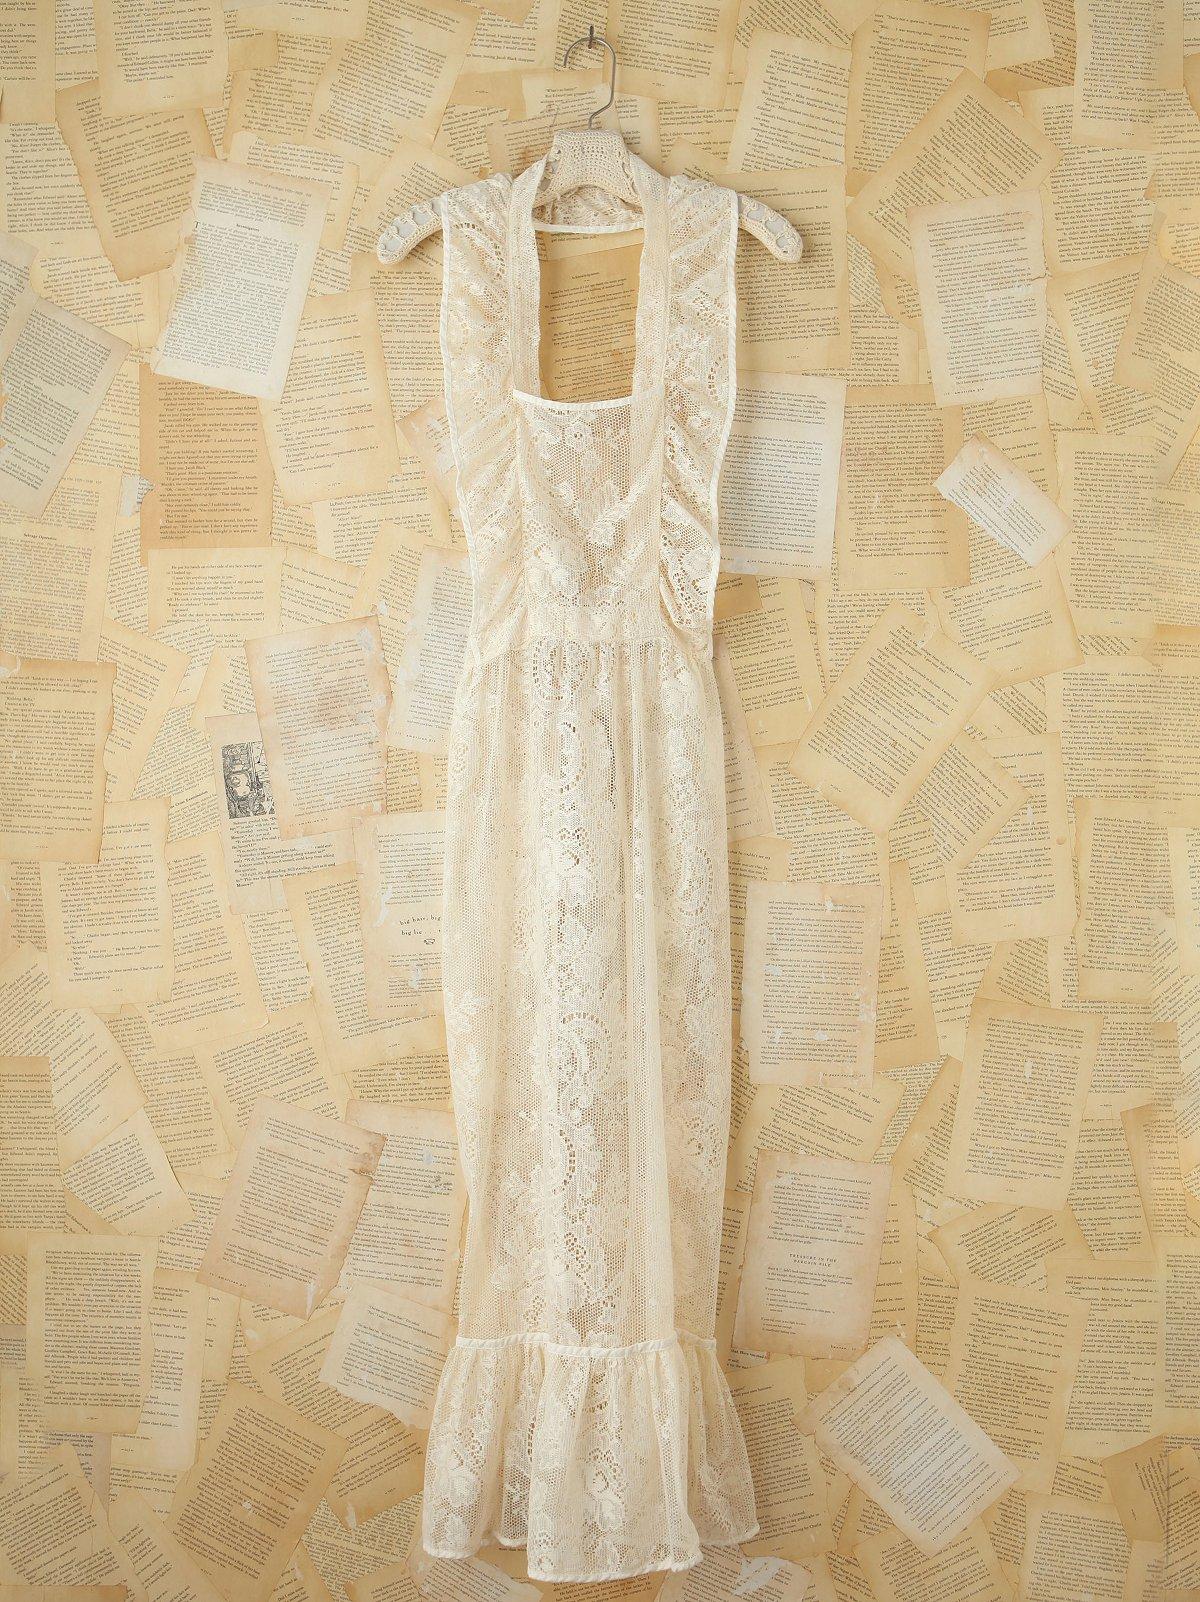 Vintage Sheer Lace Apron